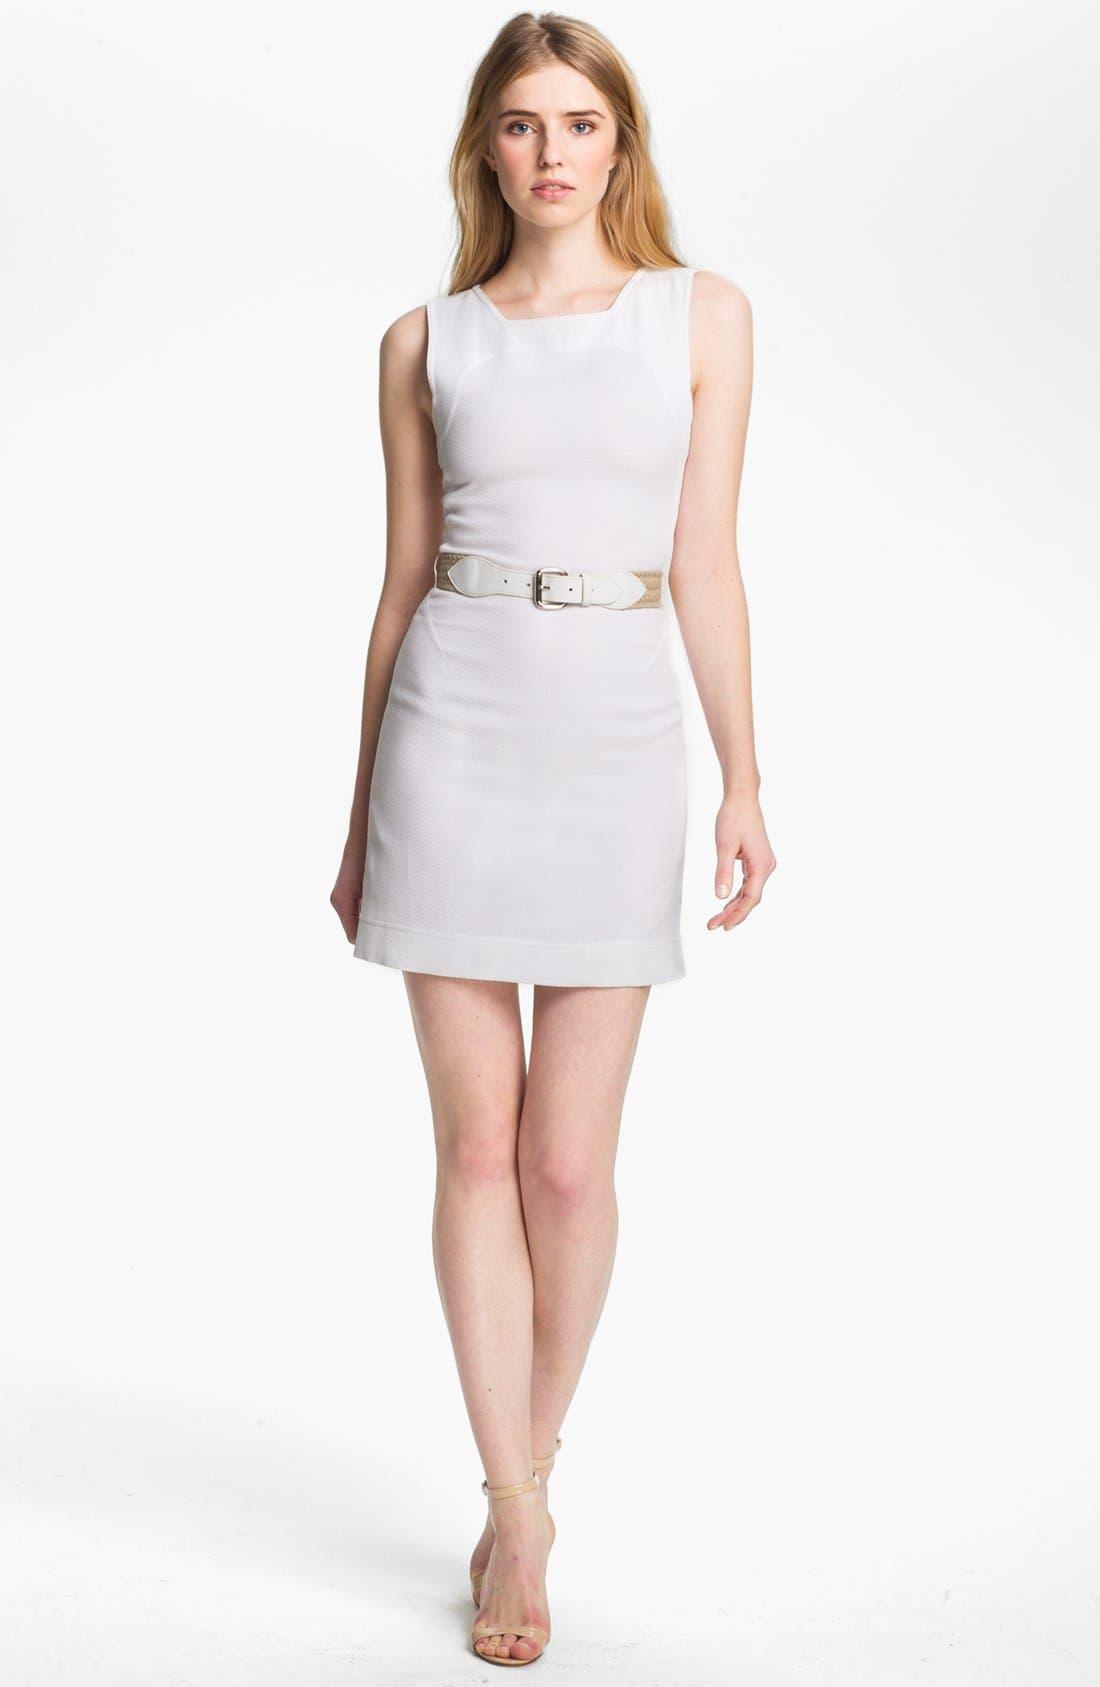 Alternate Image 1 Selected - L'AGENCE Belted Square Neck Tennis Dress